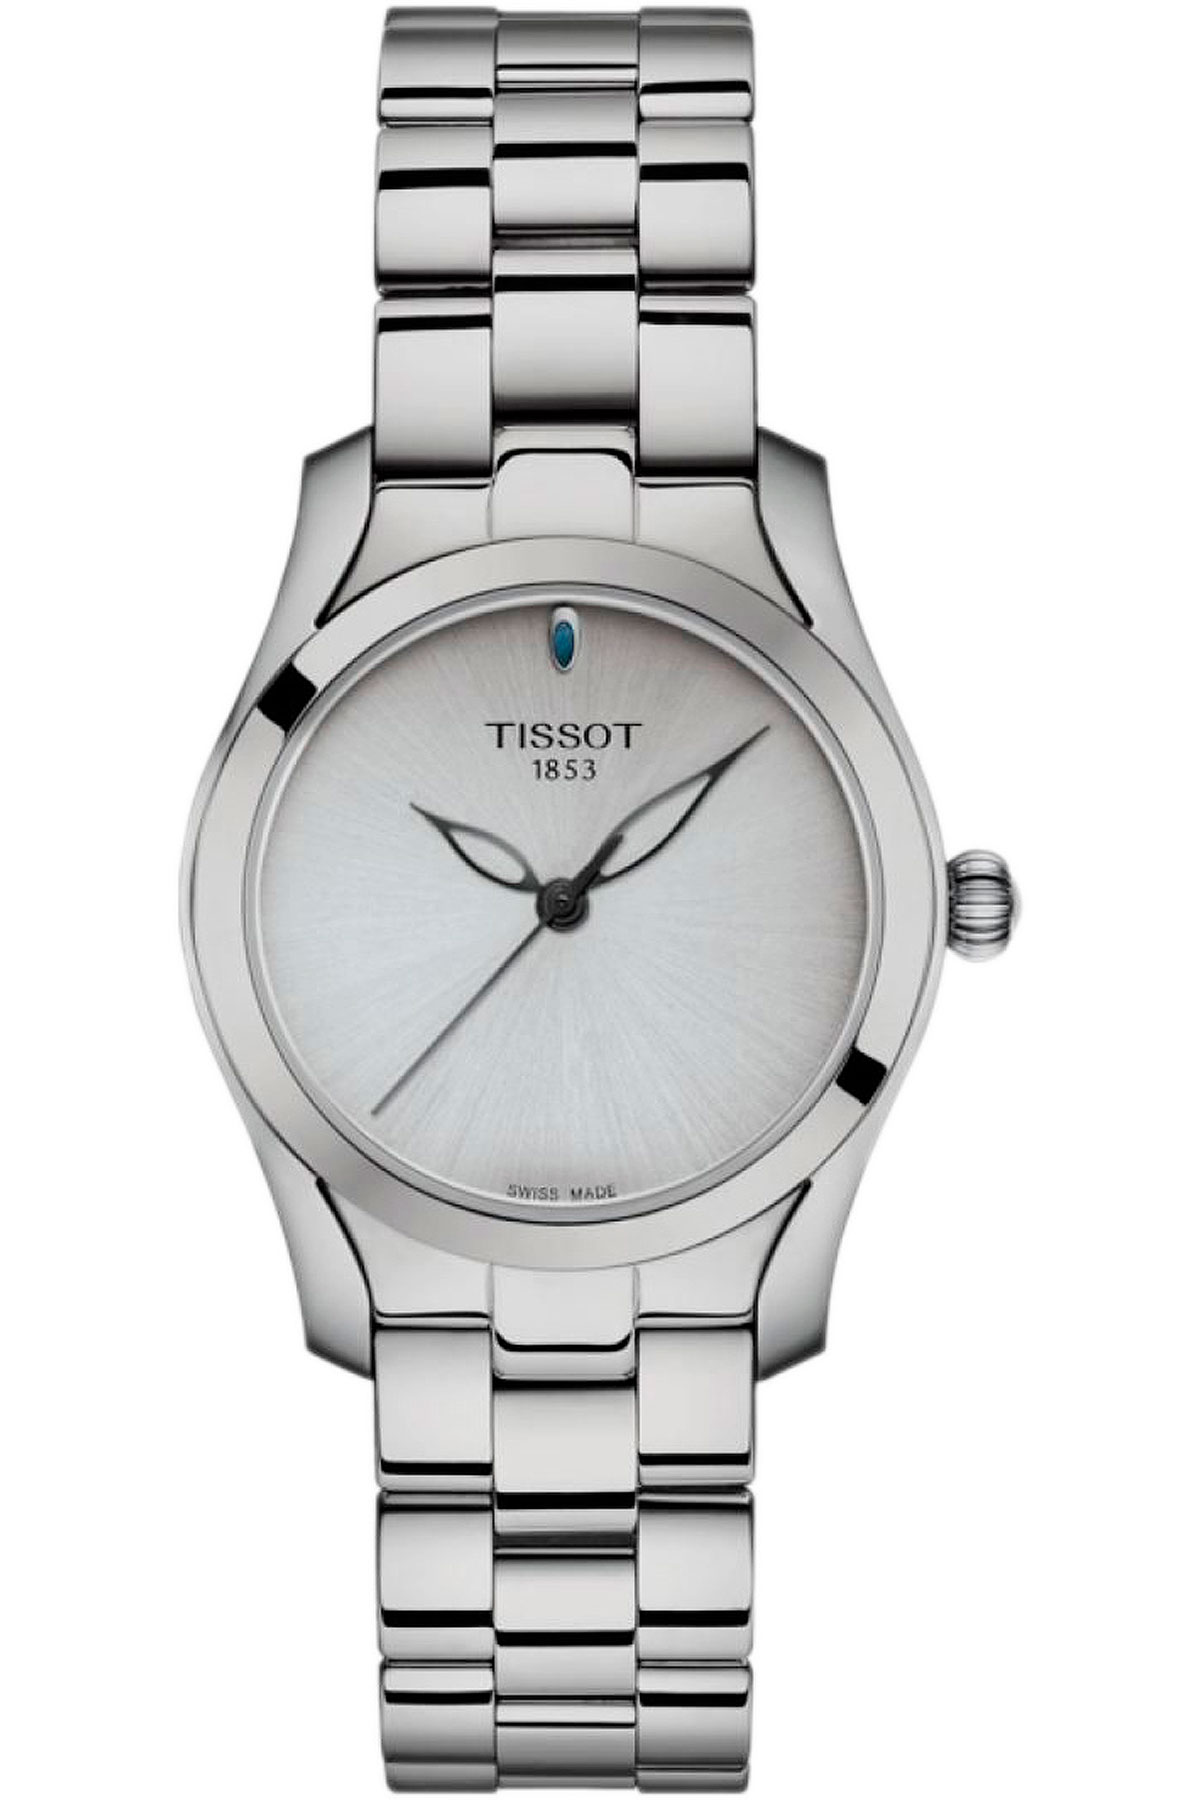 Tissot Watch for Women, Twave, Grey, Stainless Steel, 2019